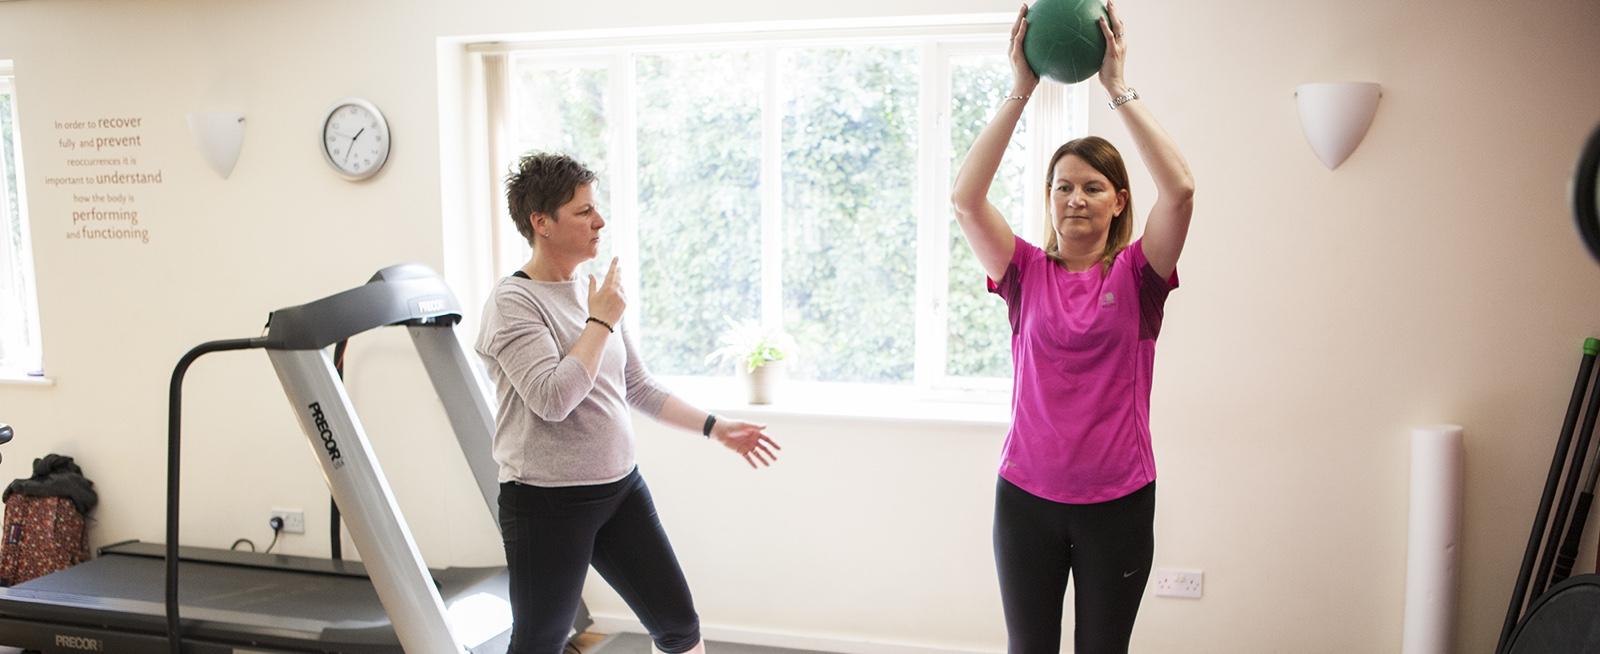 Fitness in menopause